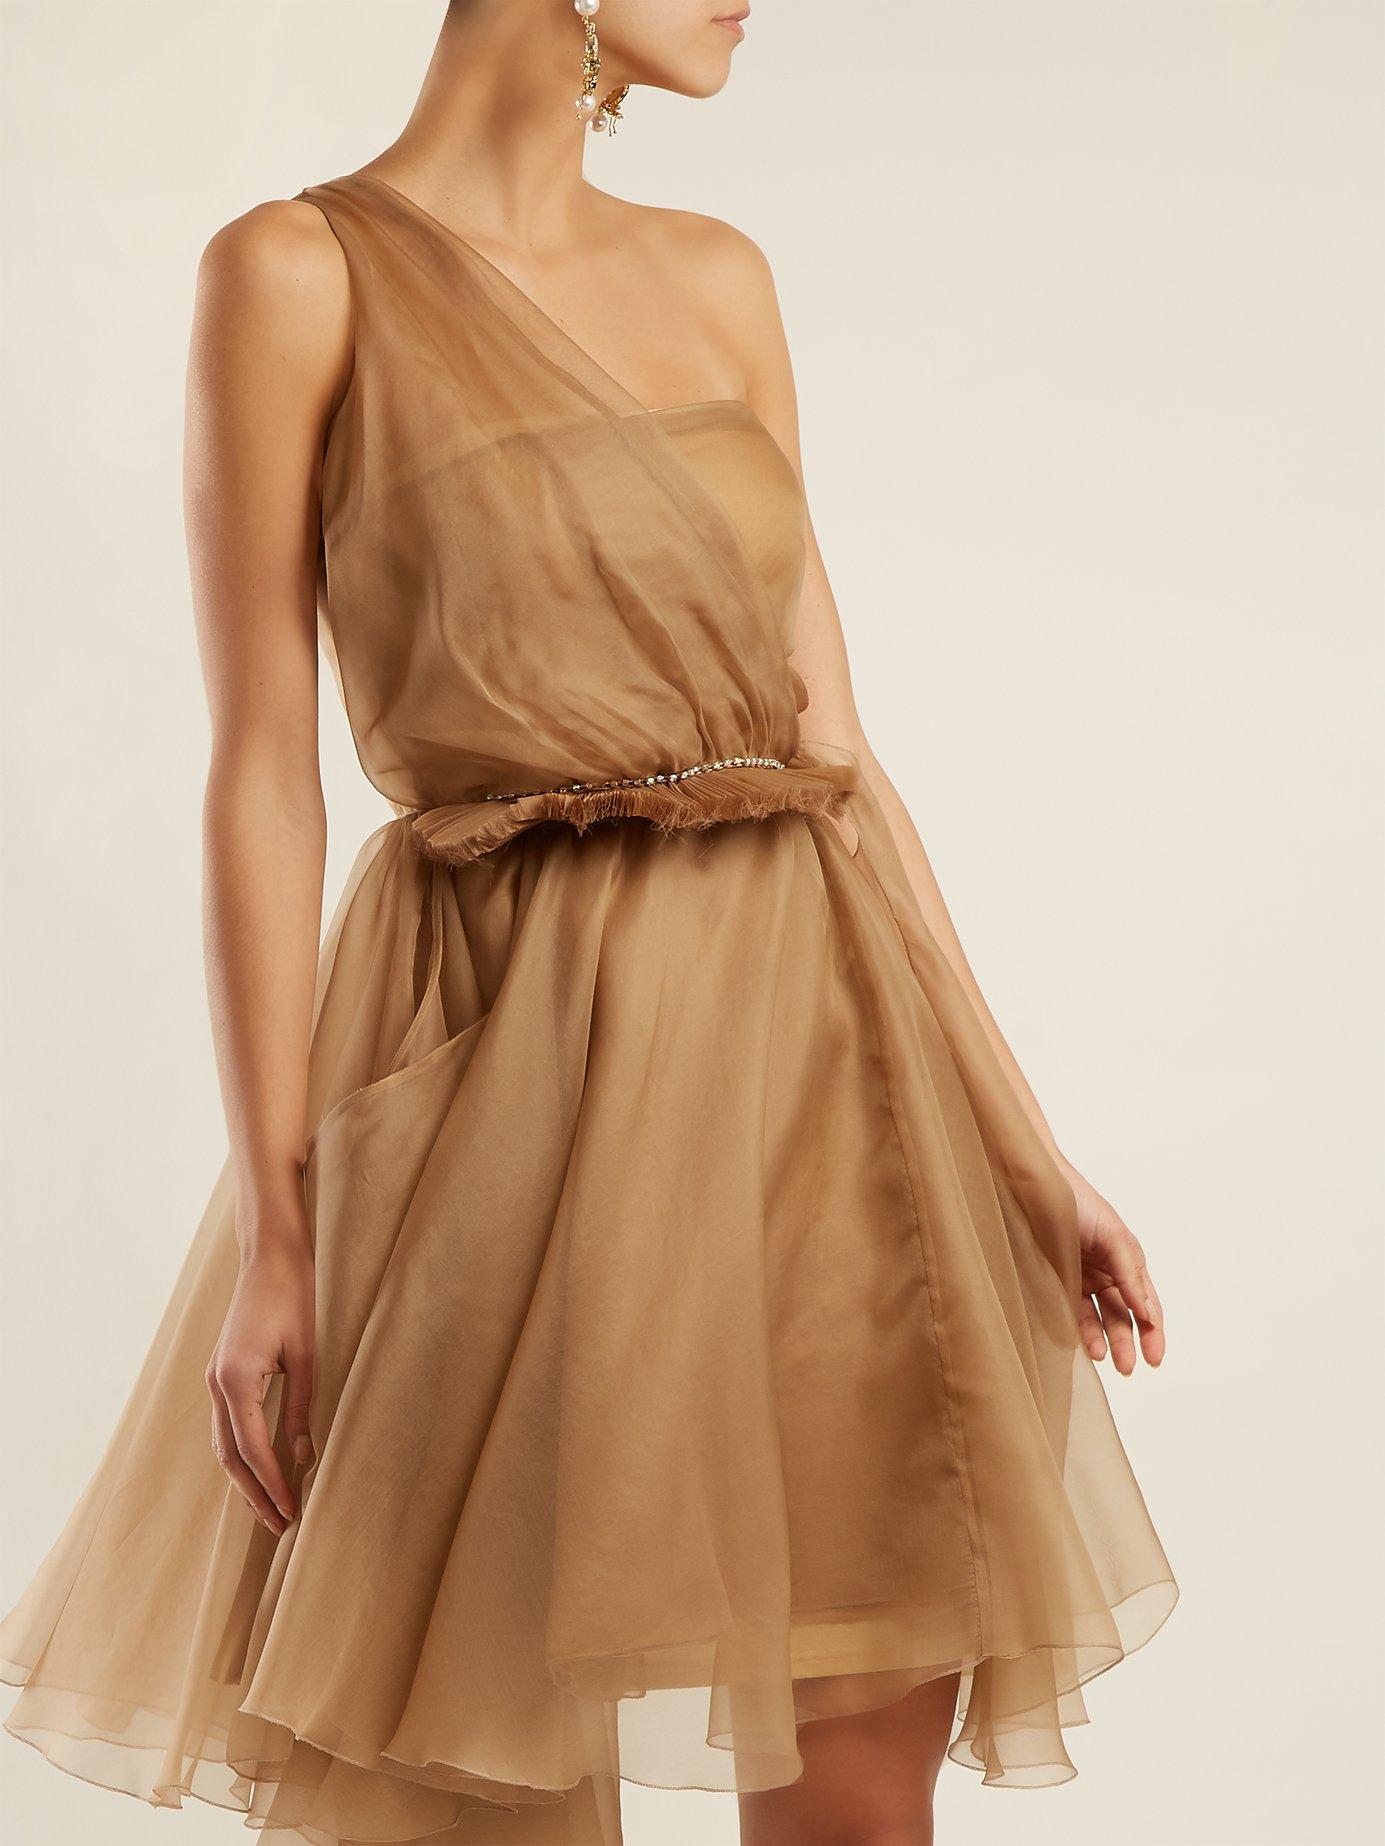 Dominique one-shoulder silk dress by Preen By Thornton Bregazzi